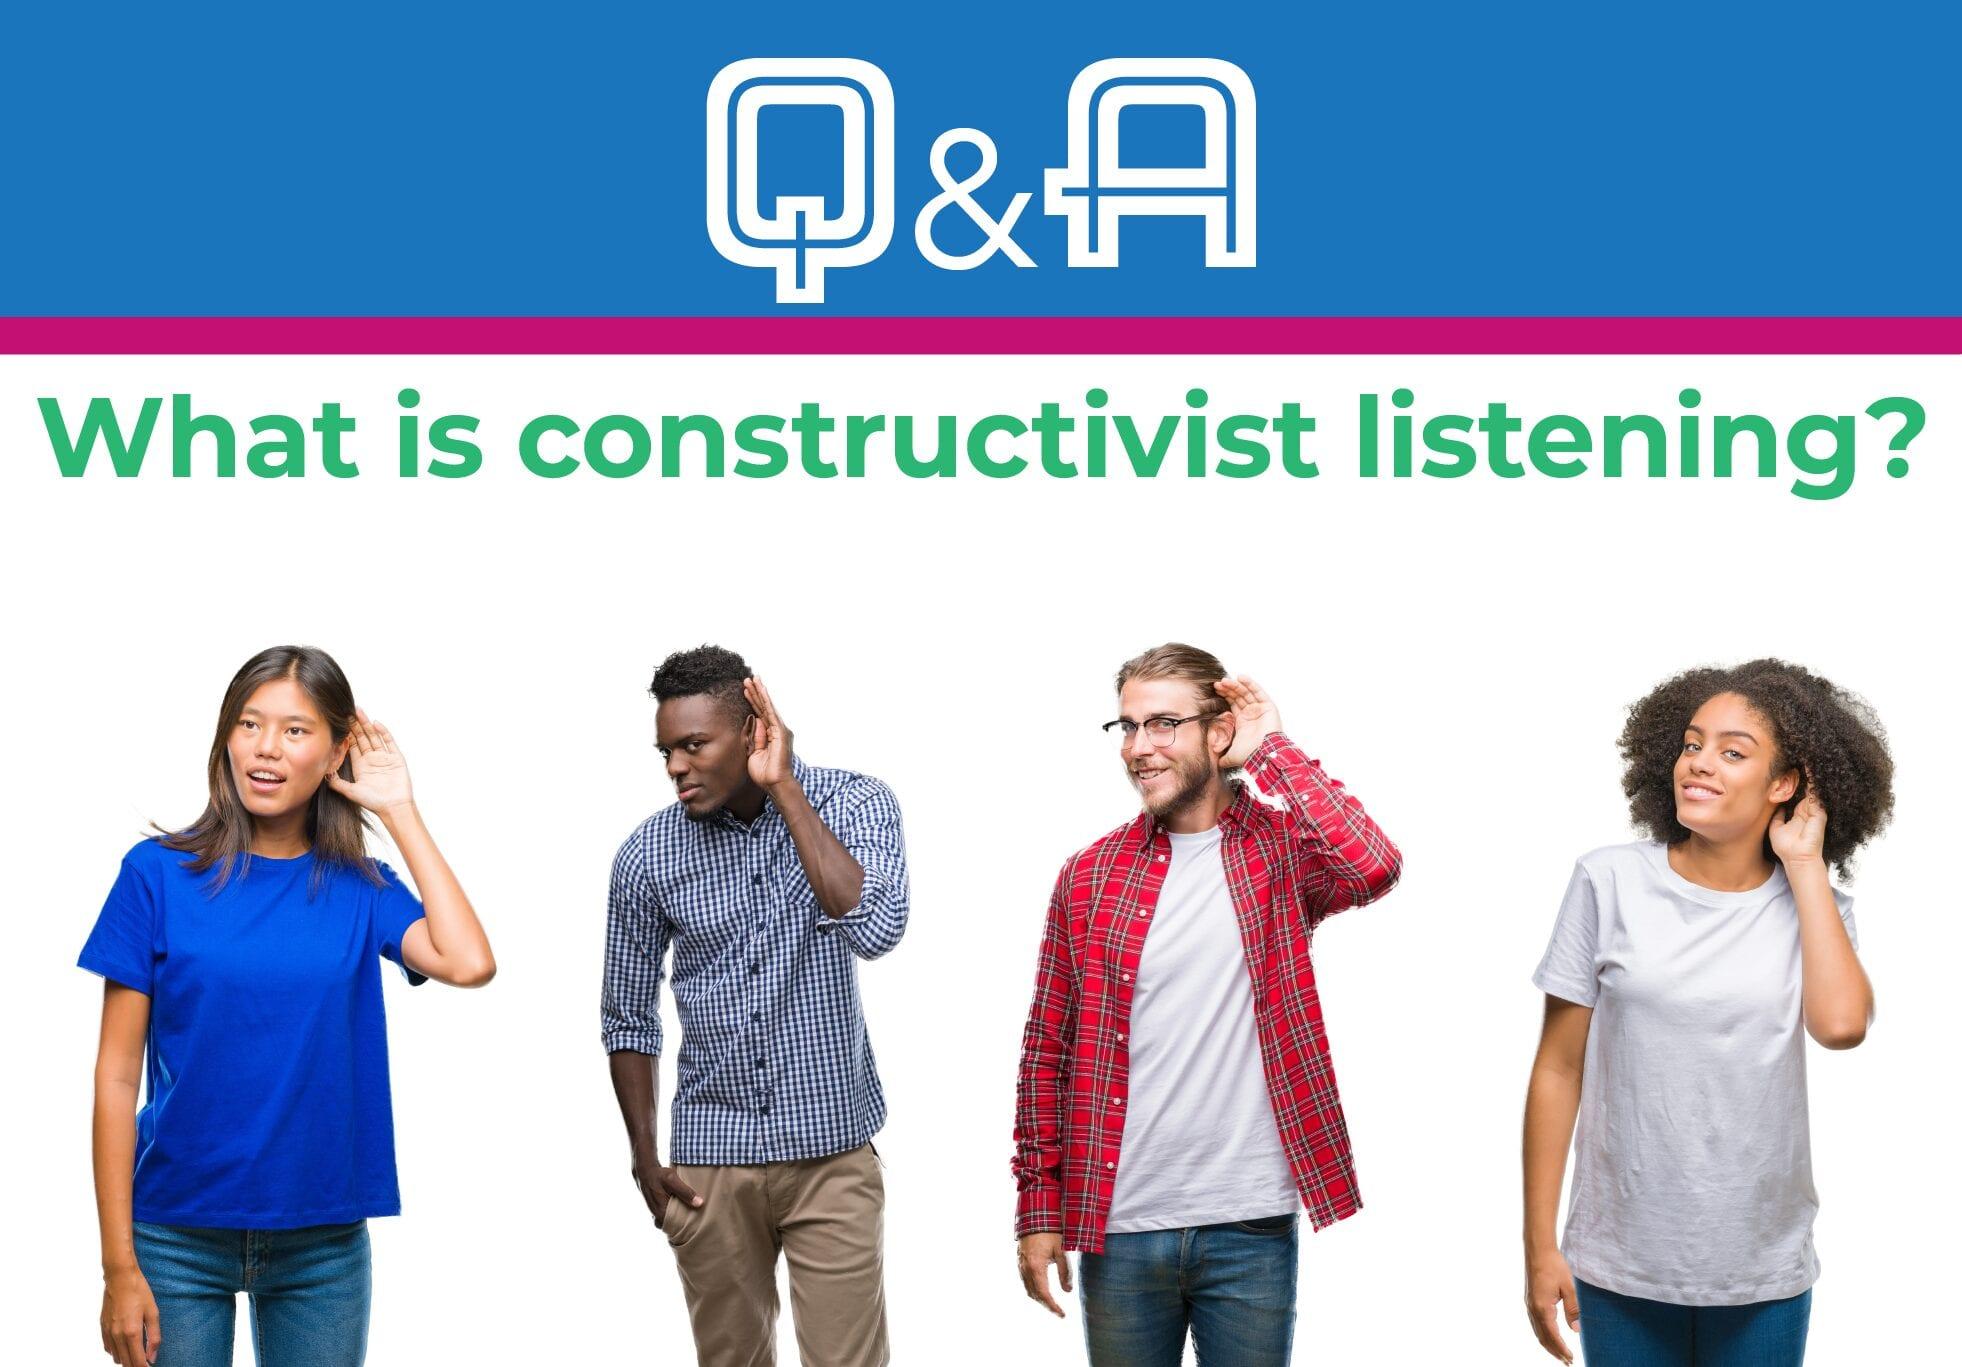 What is constructivist listening?